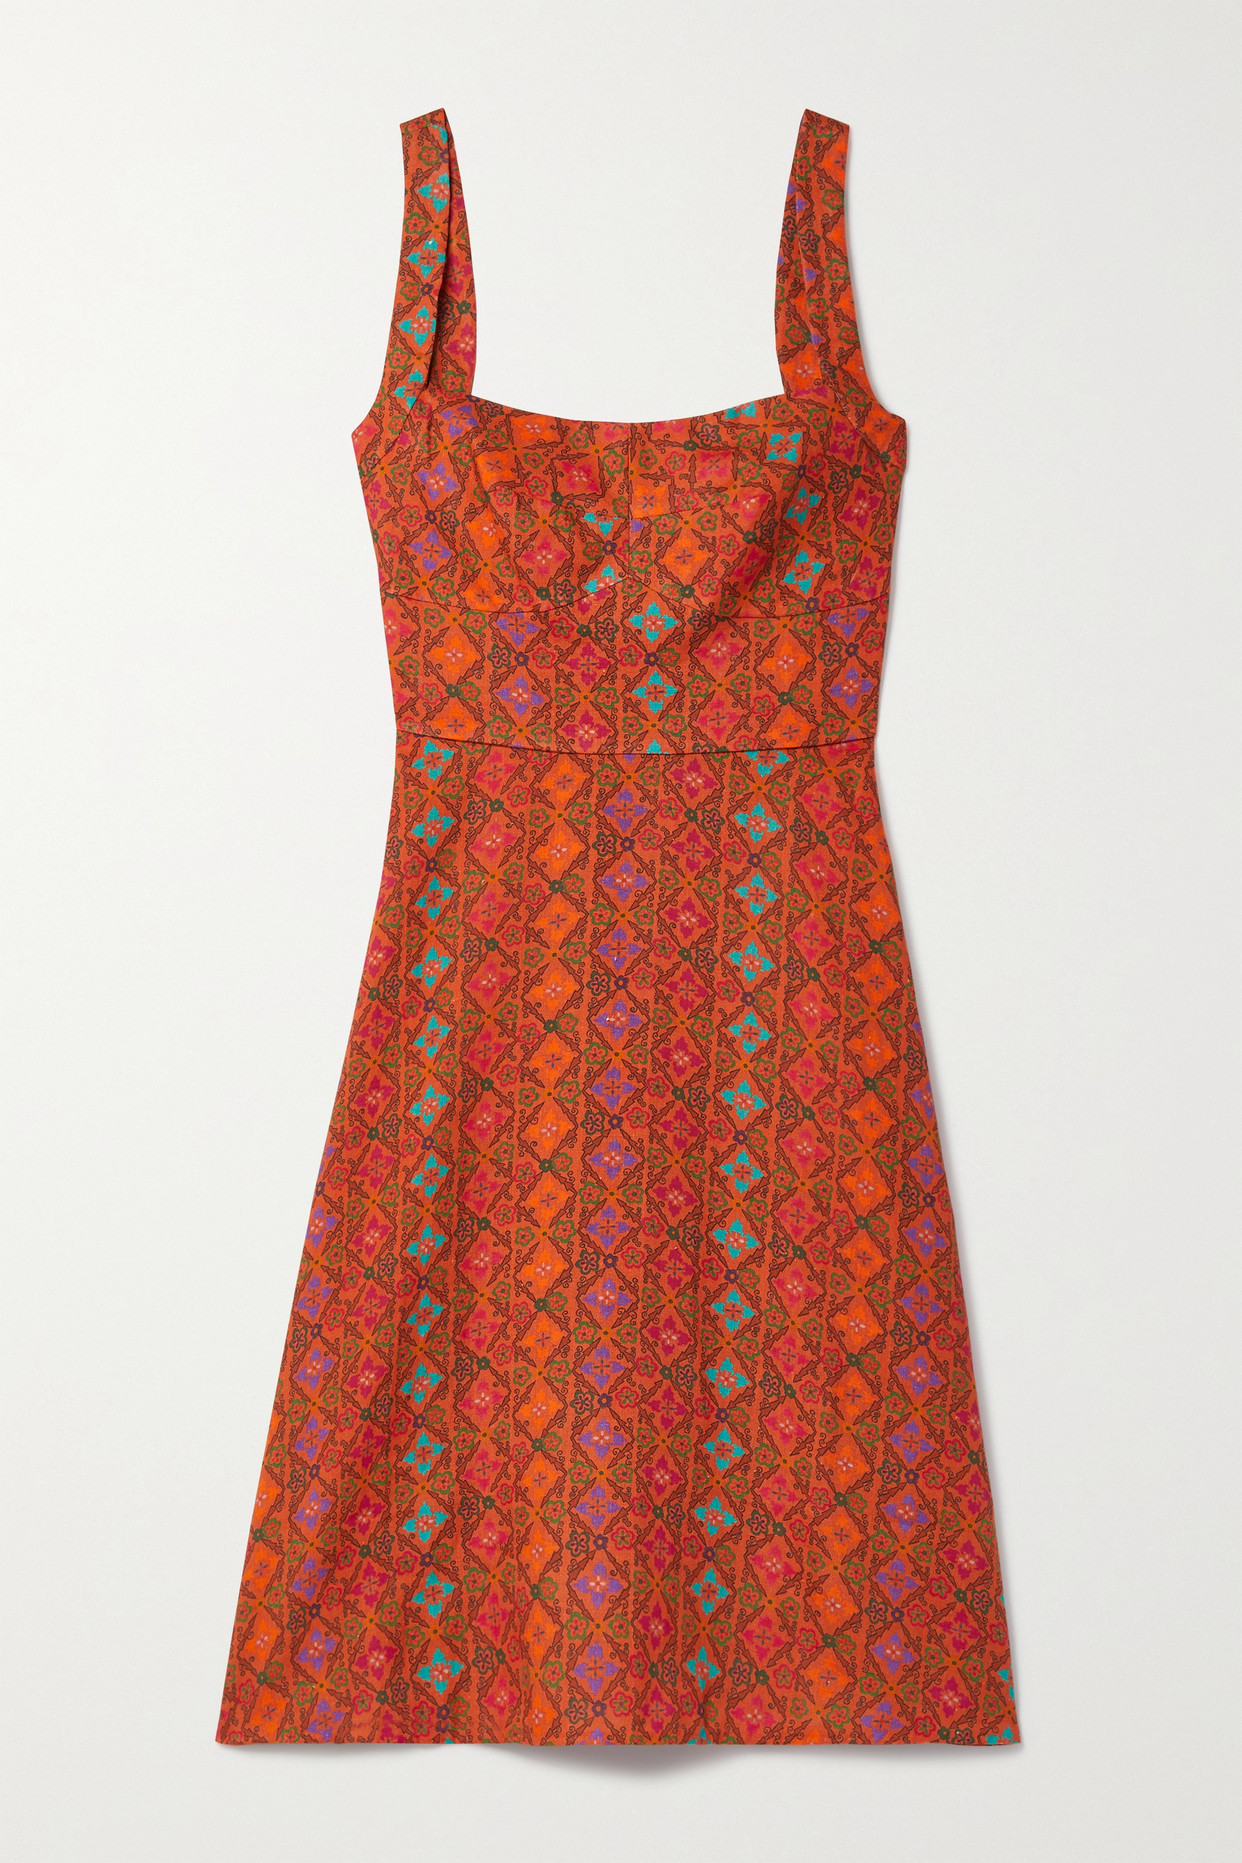 Saloni Rachel Printed Linen Mini Dress In Red